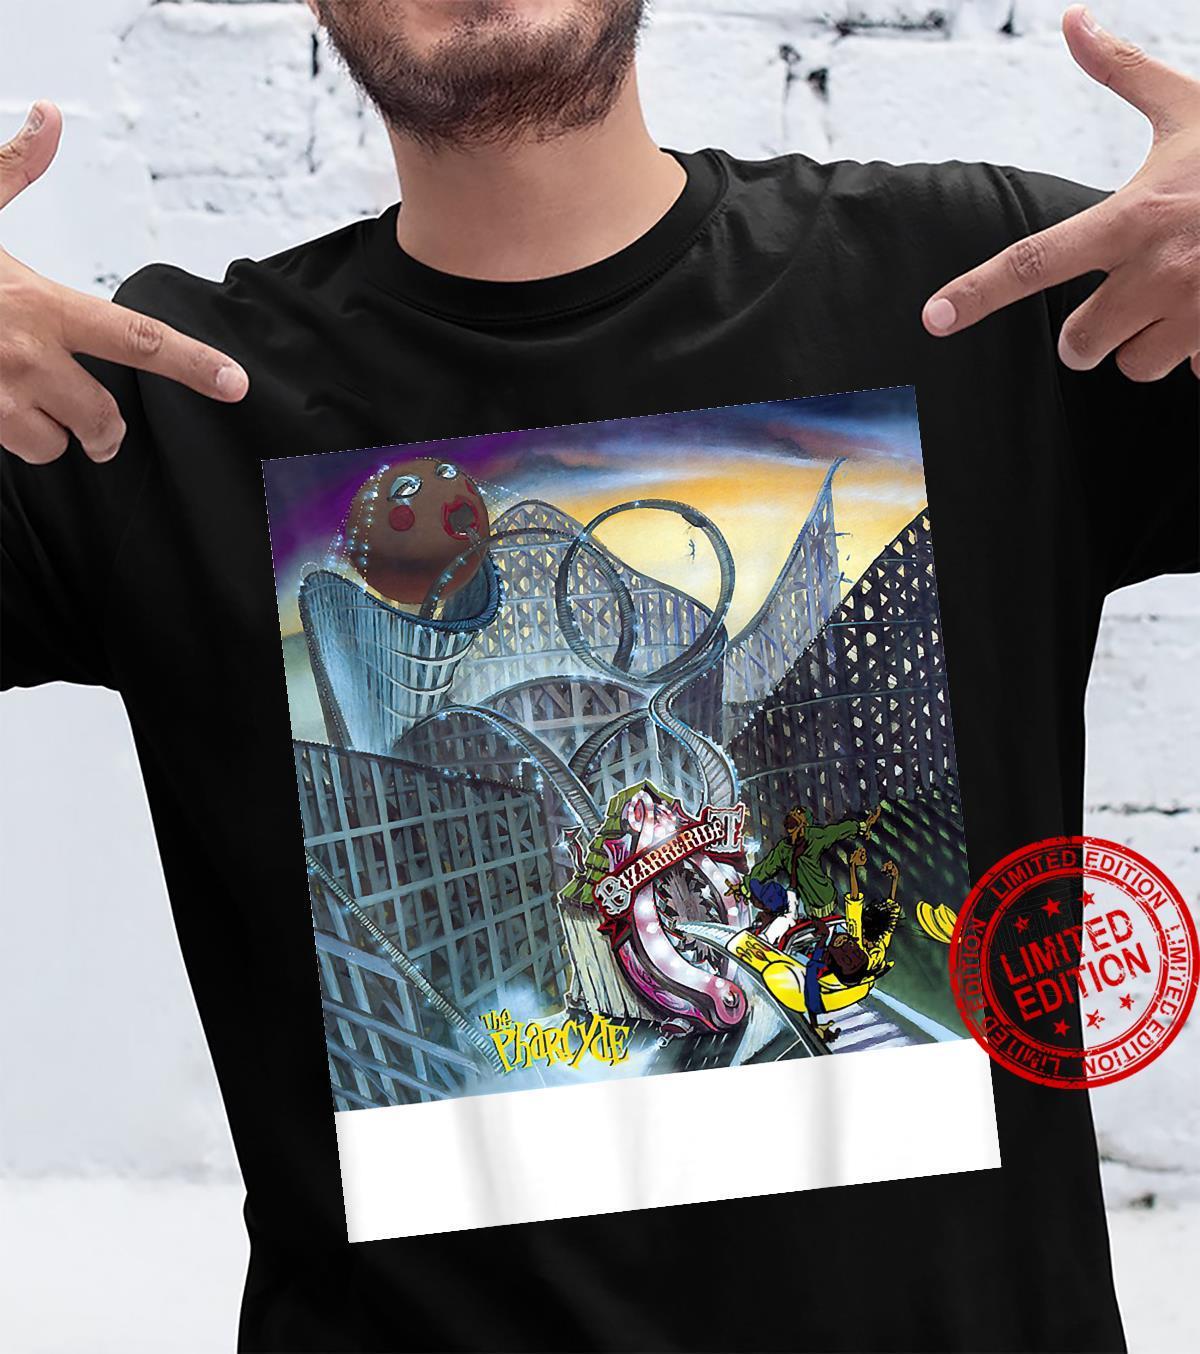 Bizarres Rides Shirt